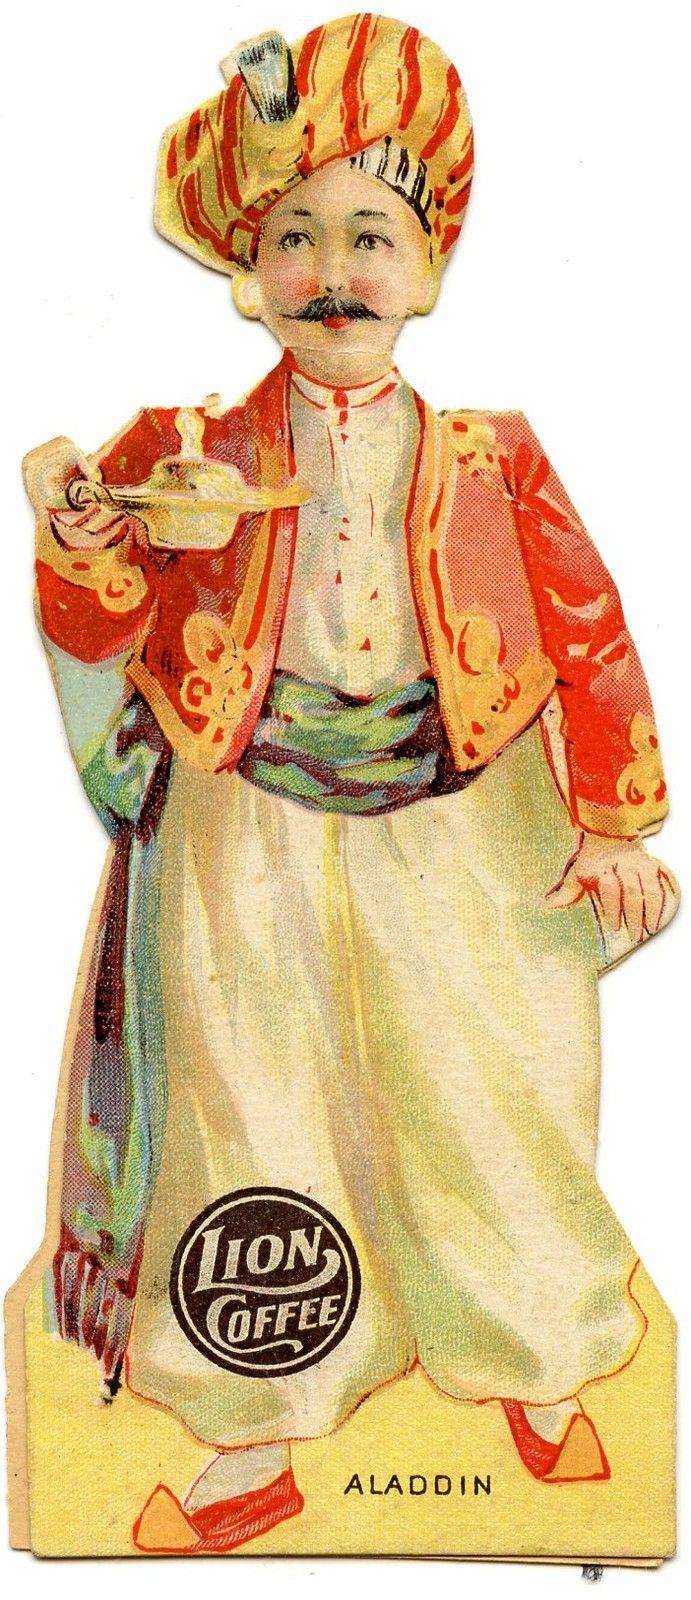 Circa 1880 S Lion Coffee Die Cut Paper Doll Aladdin And